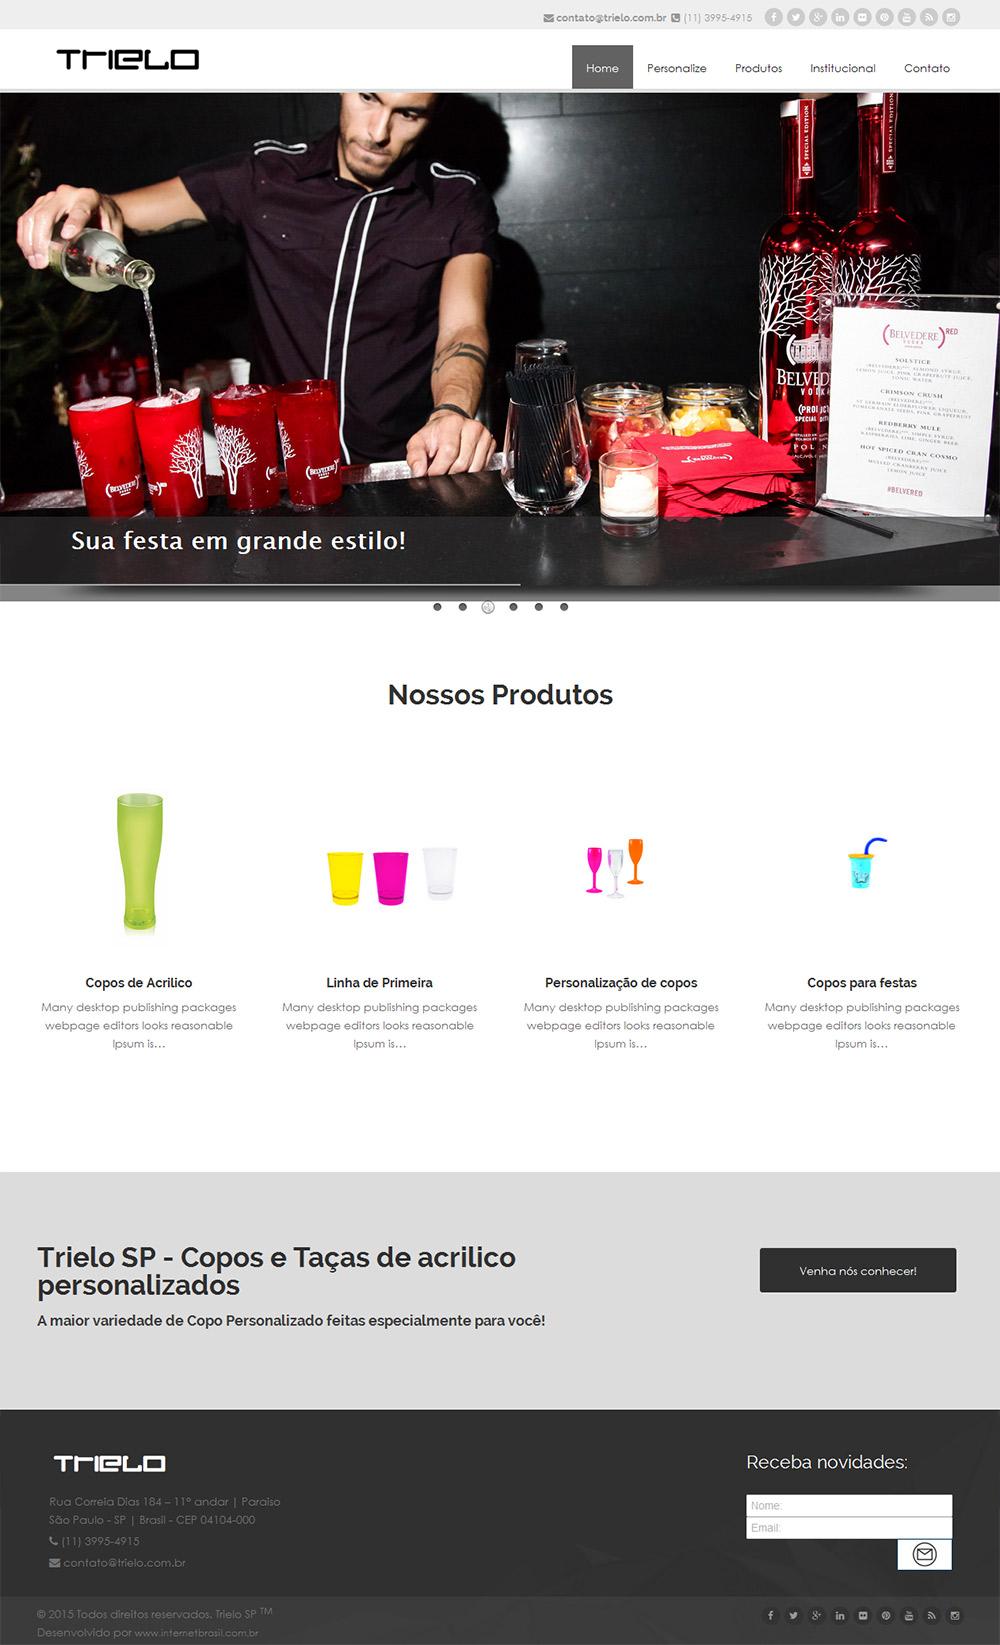 Site – Trielo SP